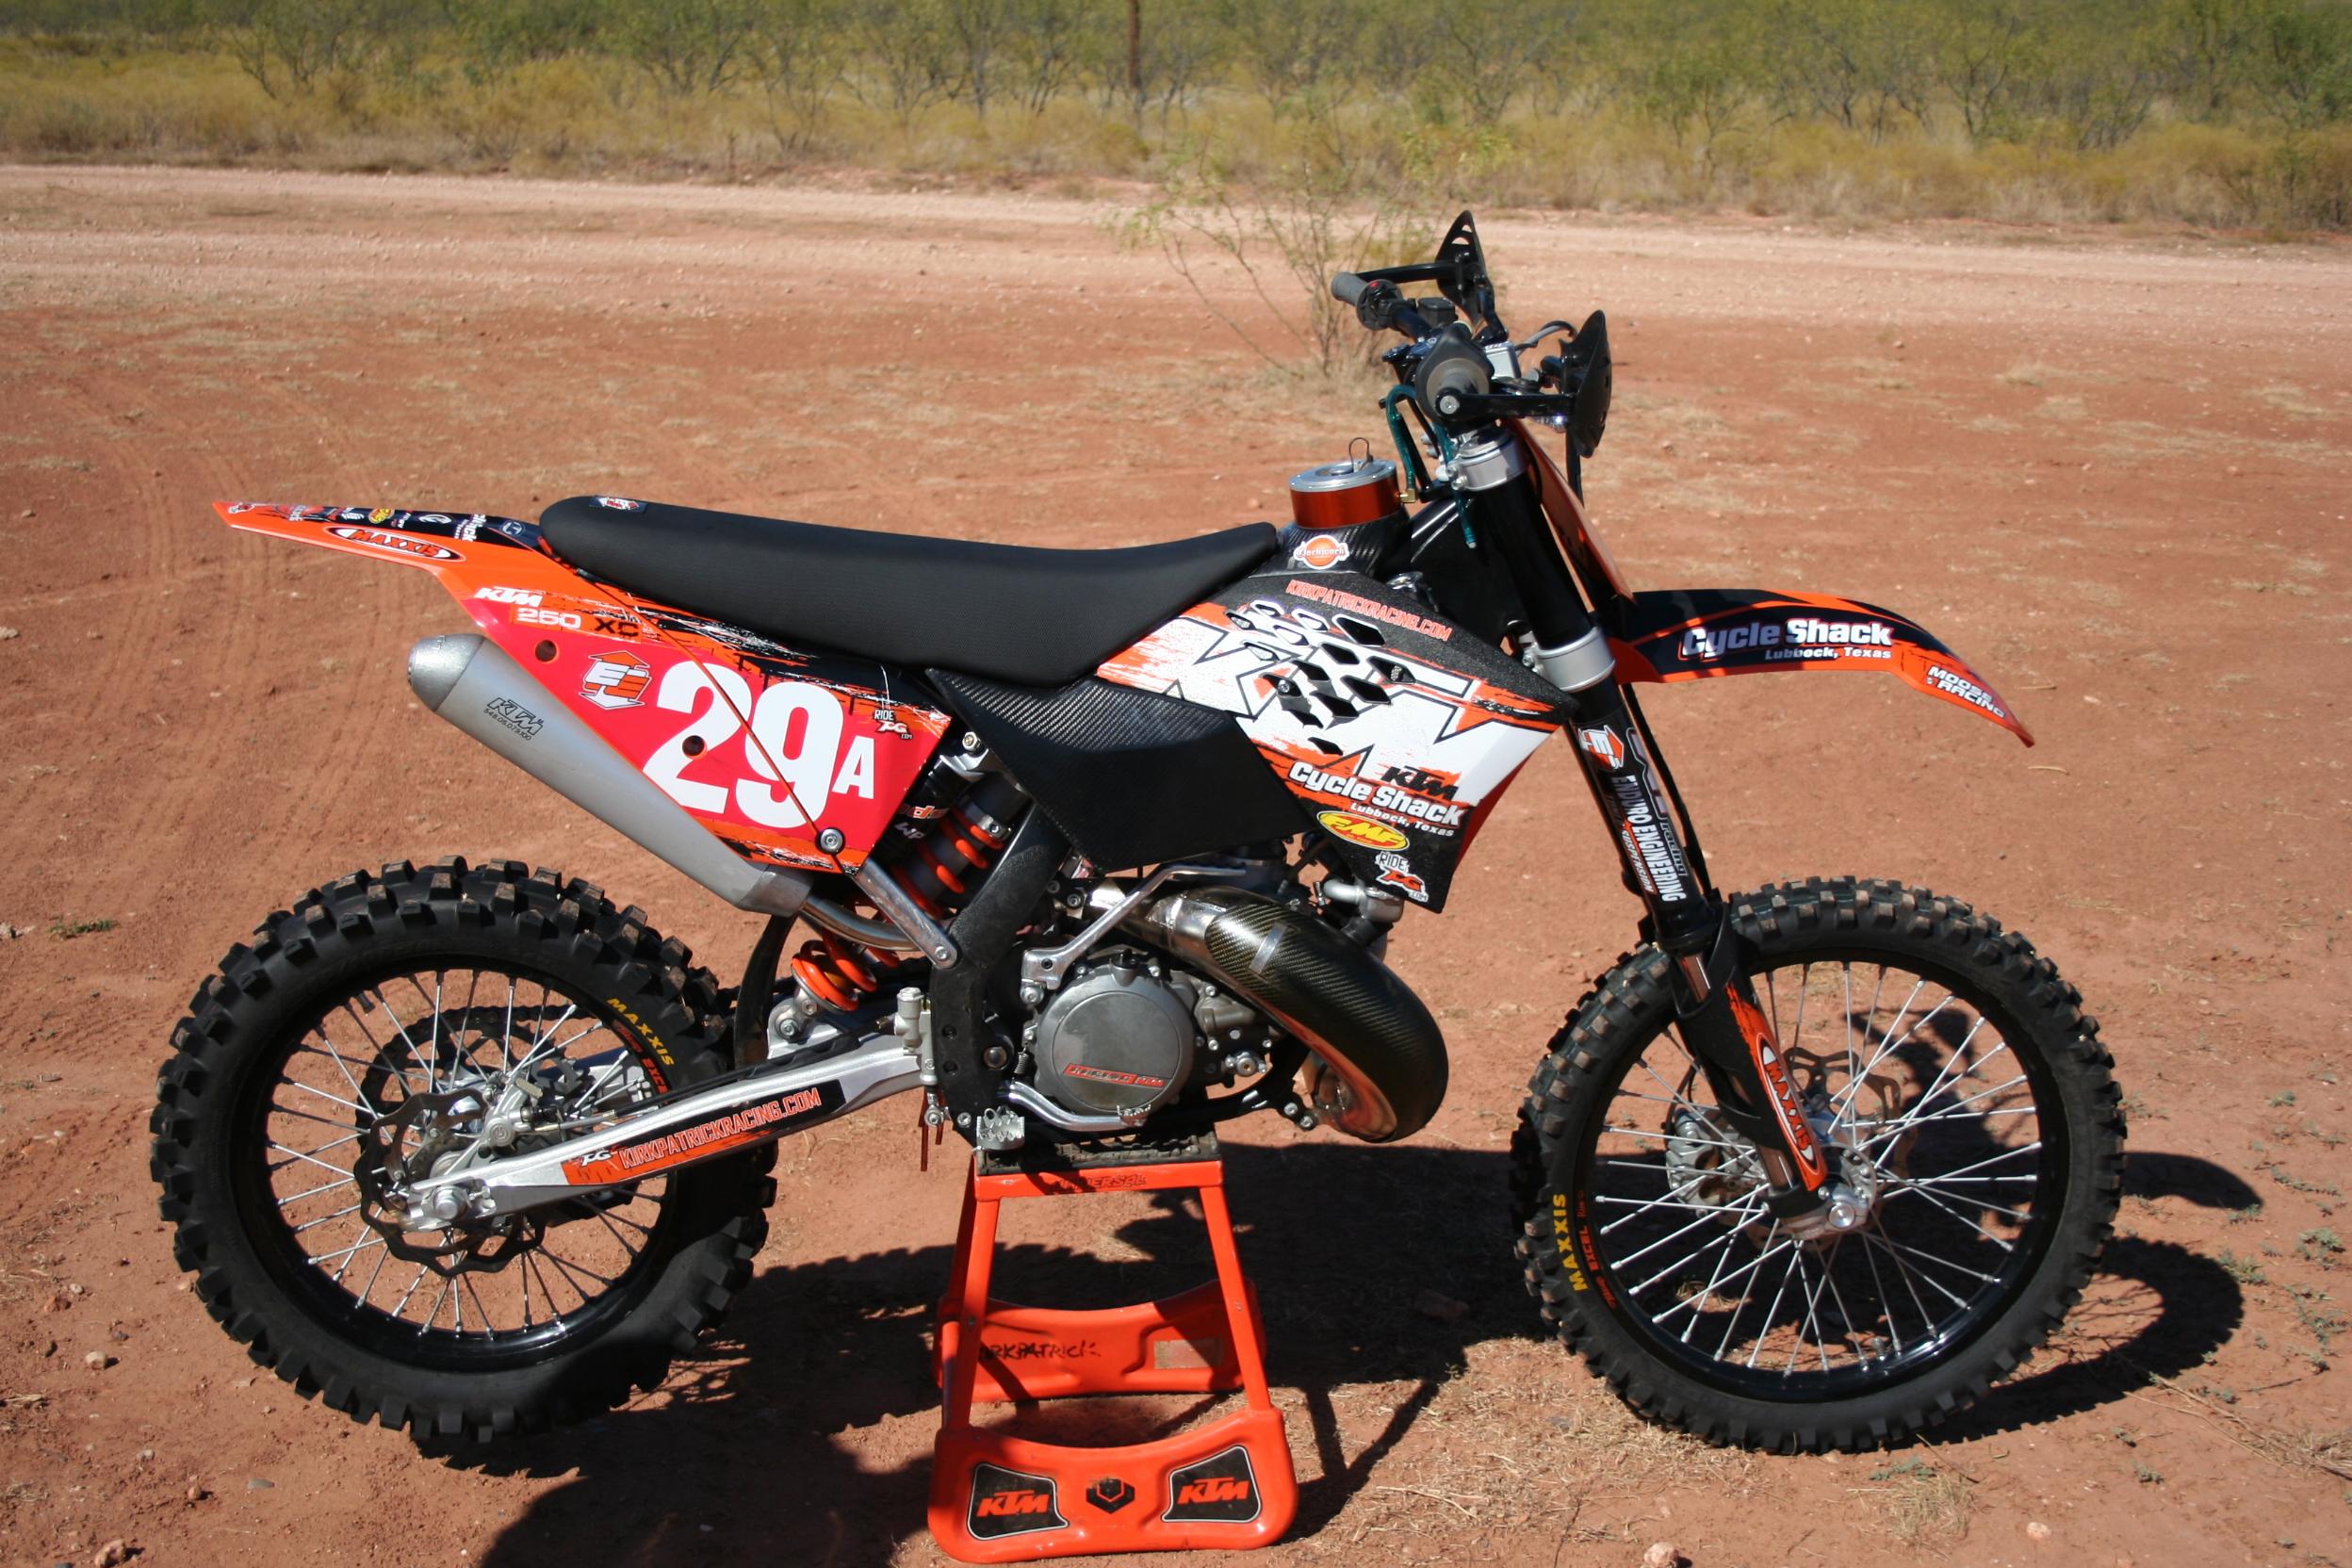 2008 KTM 250 XC